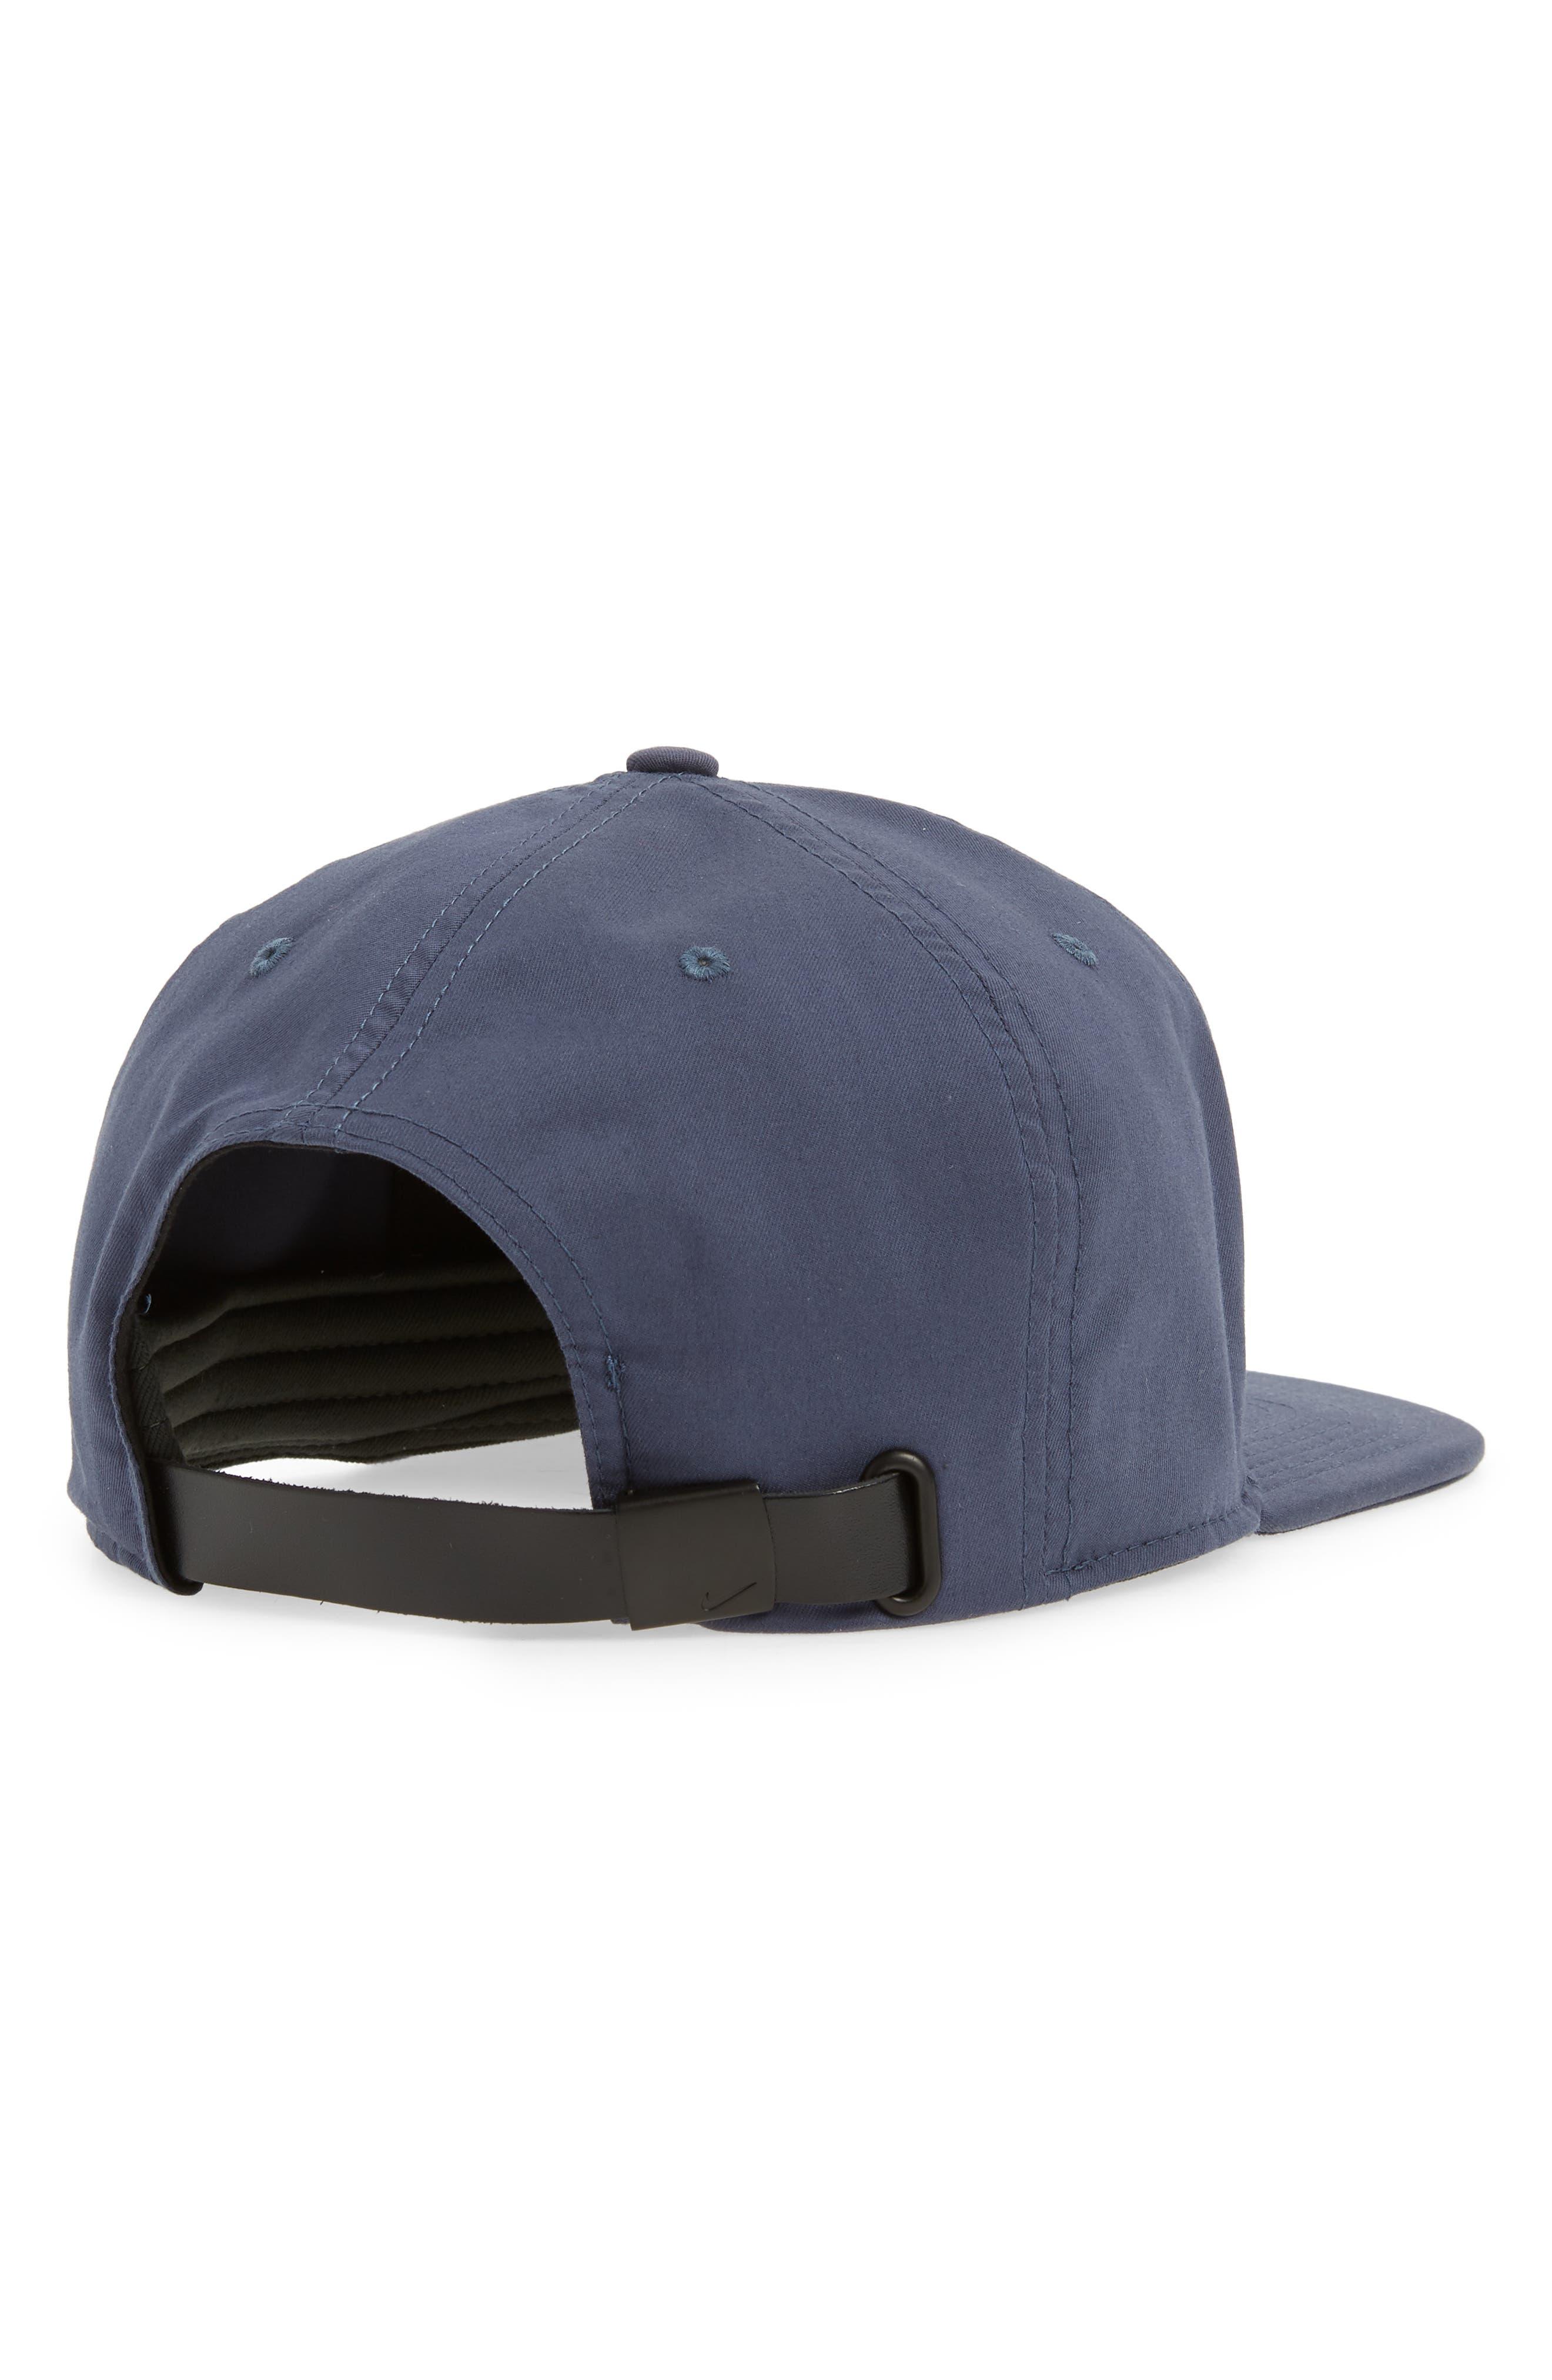 AeroBill Dry Golf Hat,                             Alternate thumbnail 4, color,